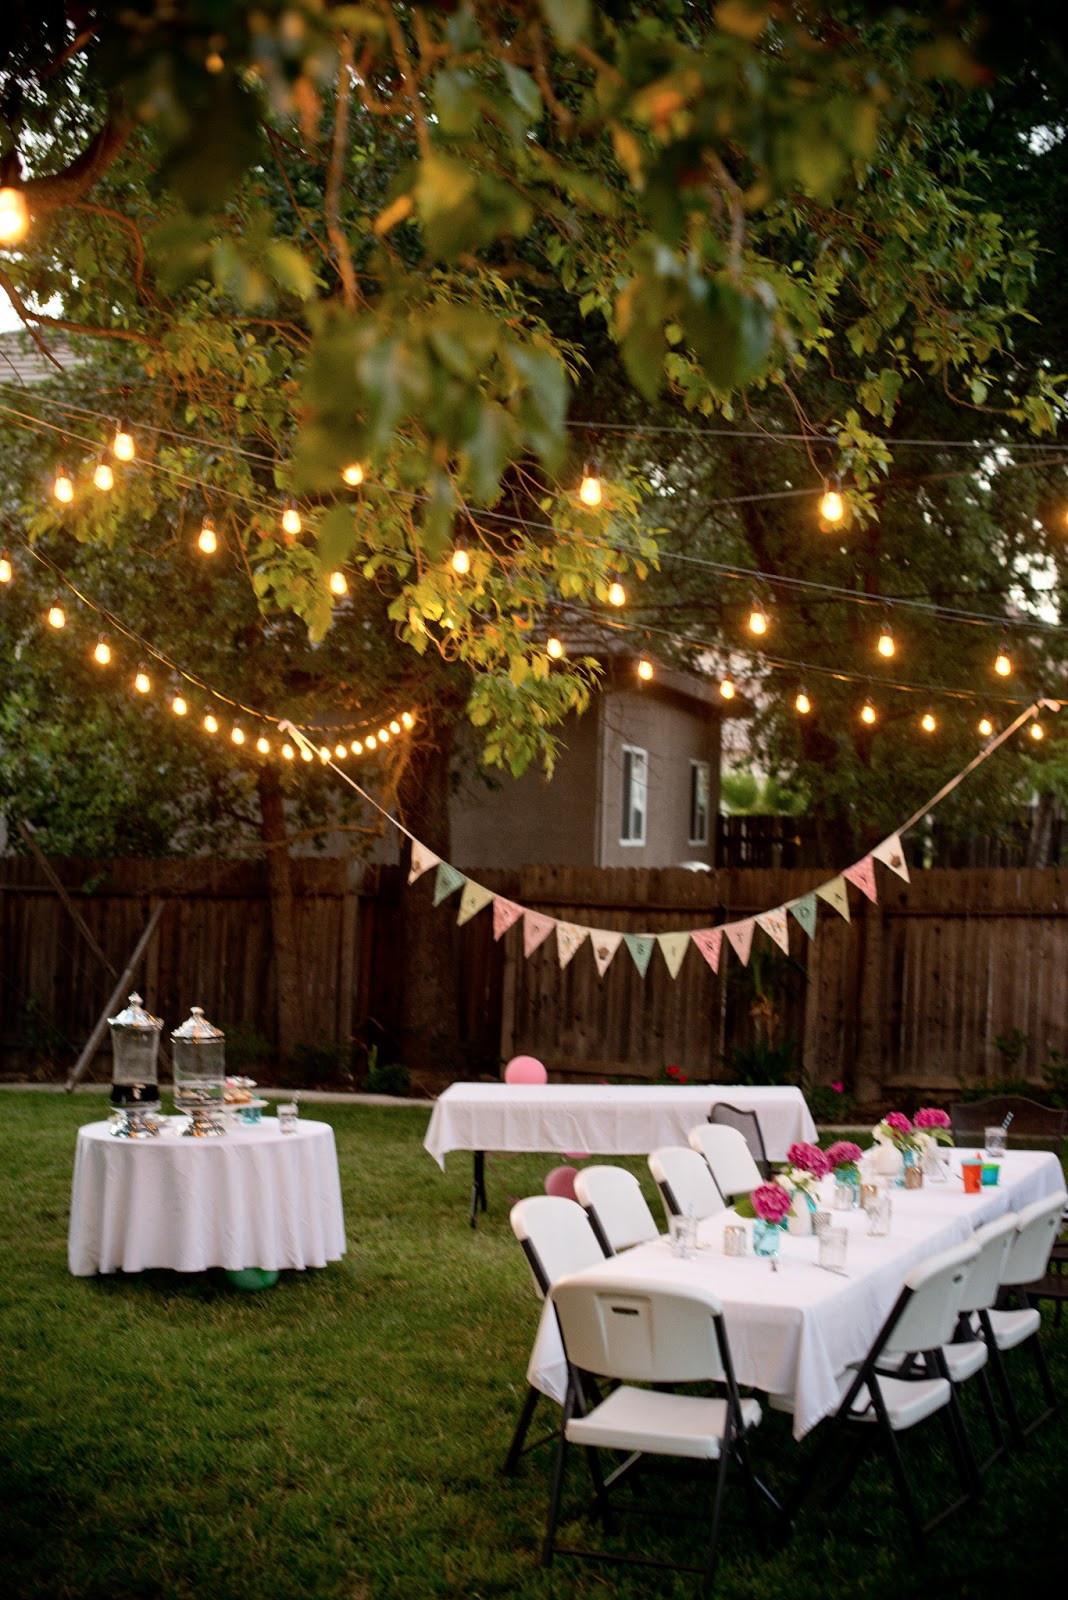 Party In Backyard Ideas  Domestic Fashionista Backyard Birthday Fun Pink